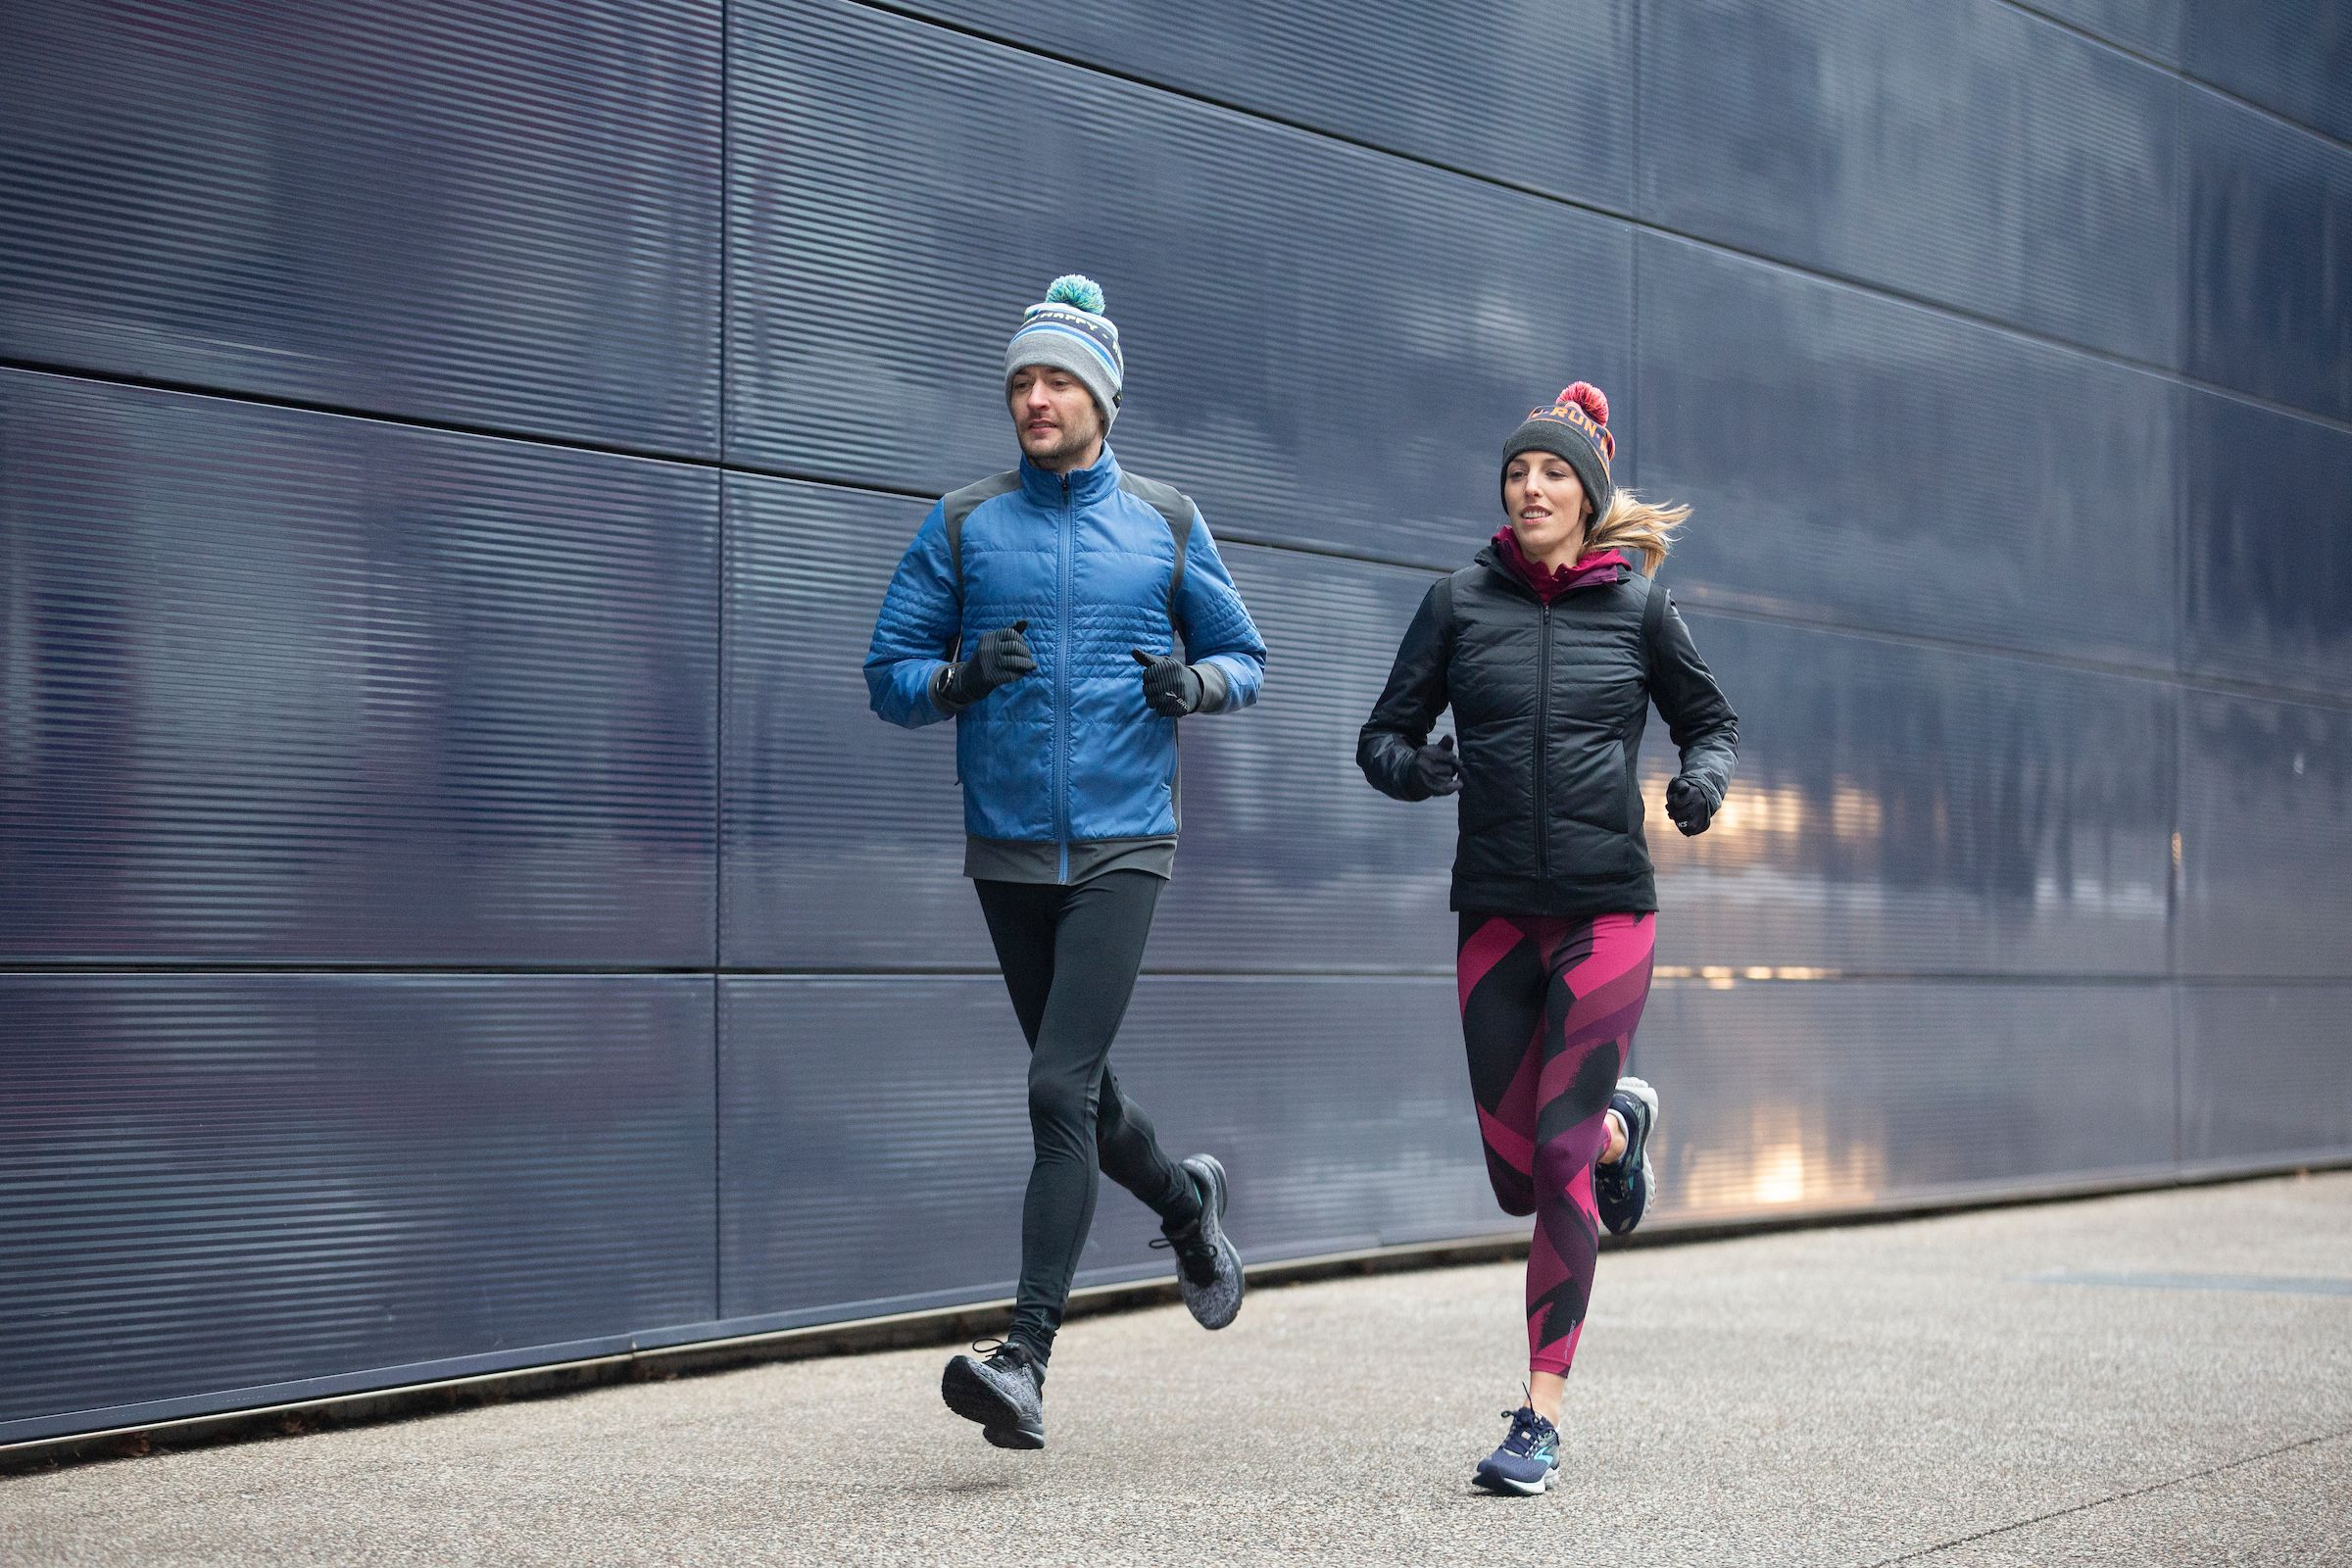 Runners Will Gather to Celebrate Gabe Grunewald Day